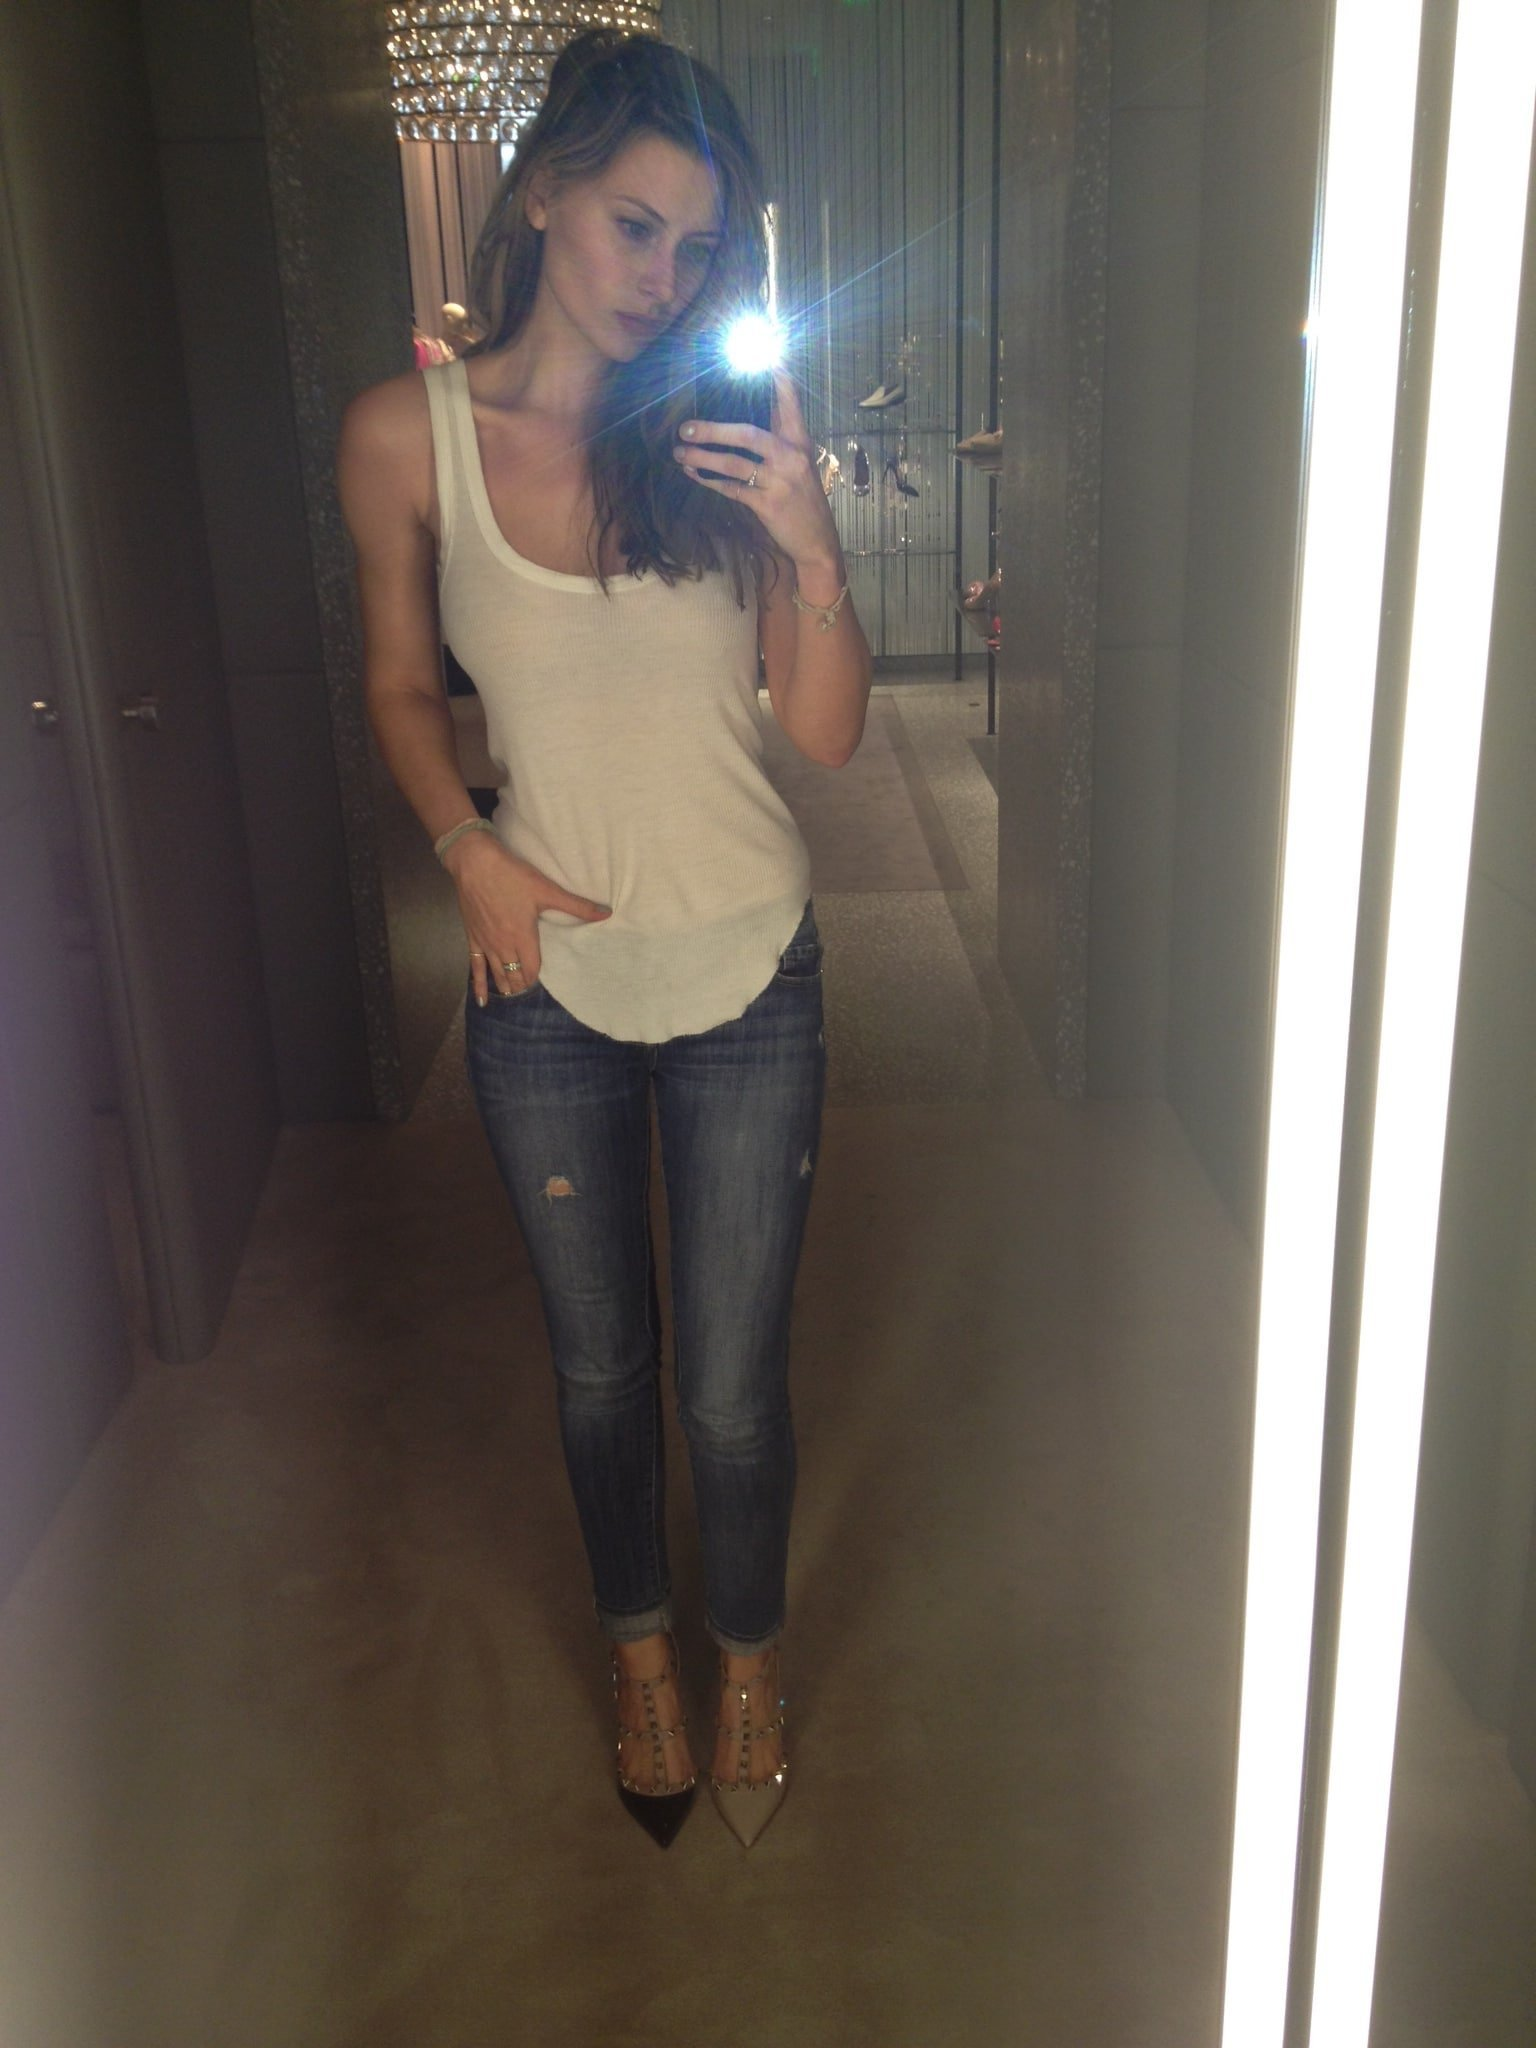 Alyson Michalka Desnuda whoa! aly michalka nude fappening photos leaked!